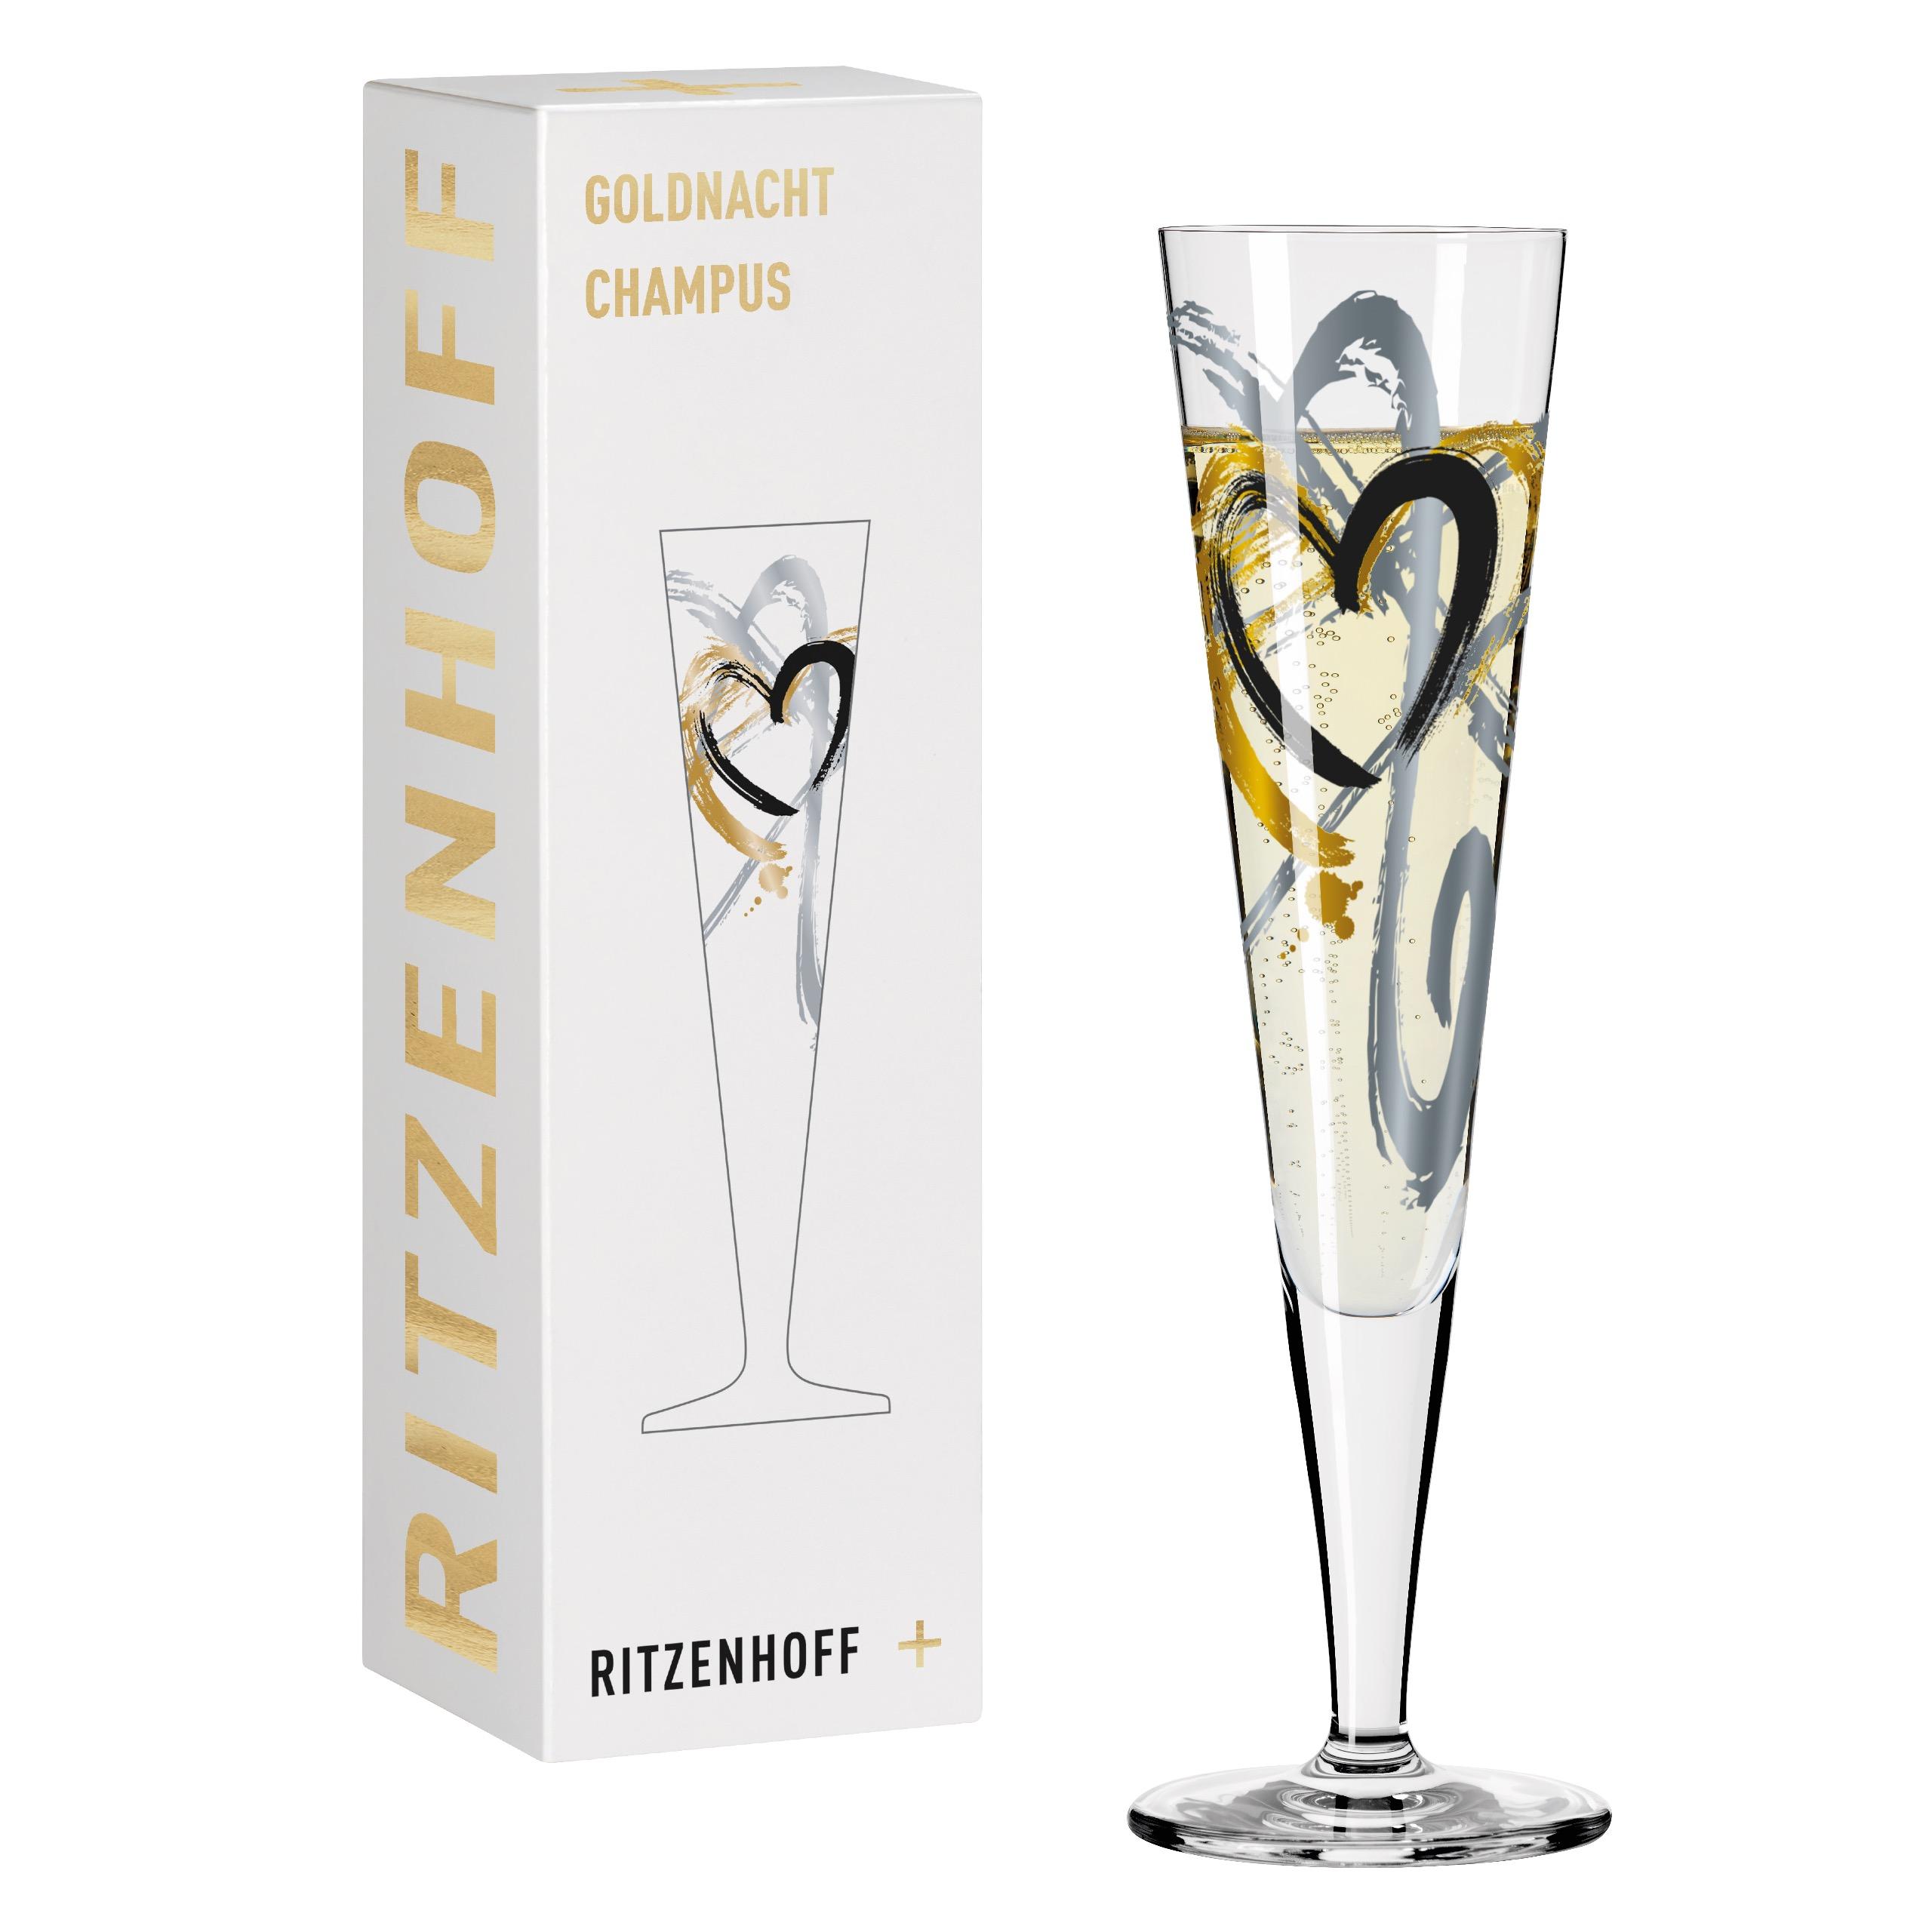 Ritzenhoff Goldnight Champagne Marutschke